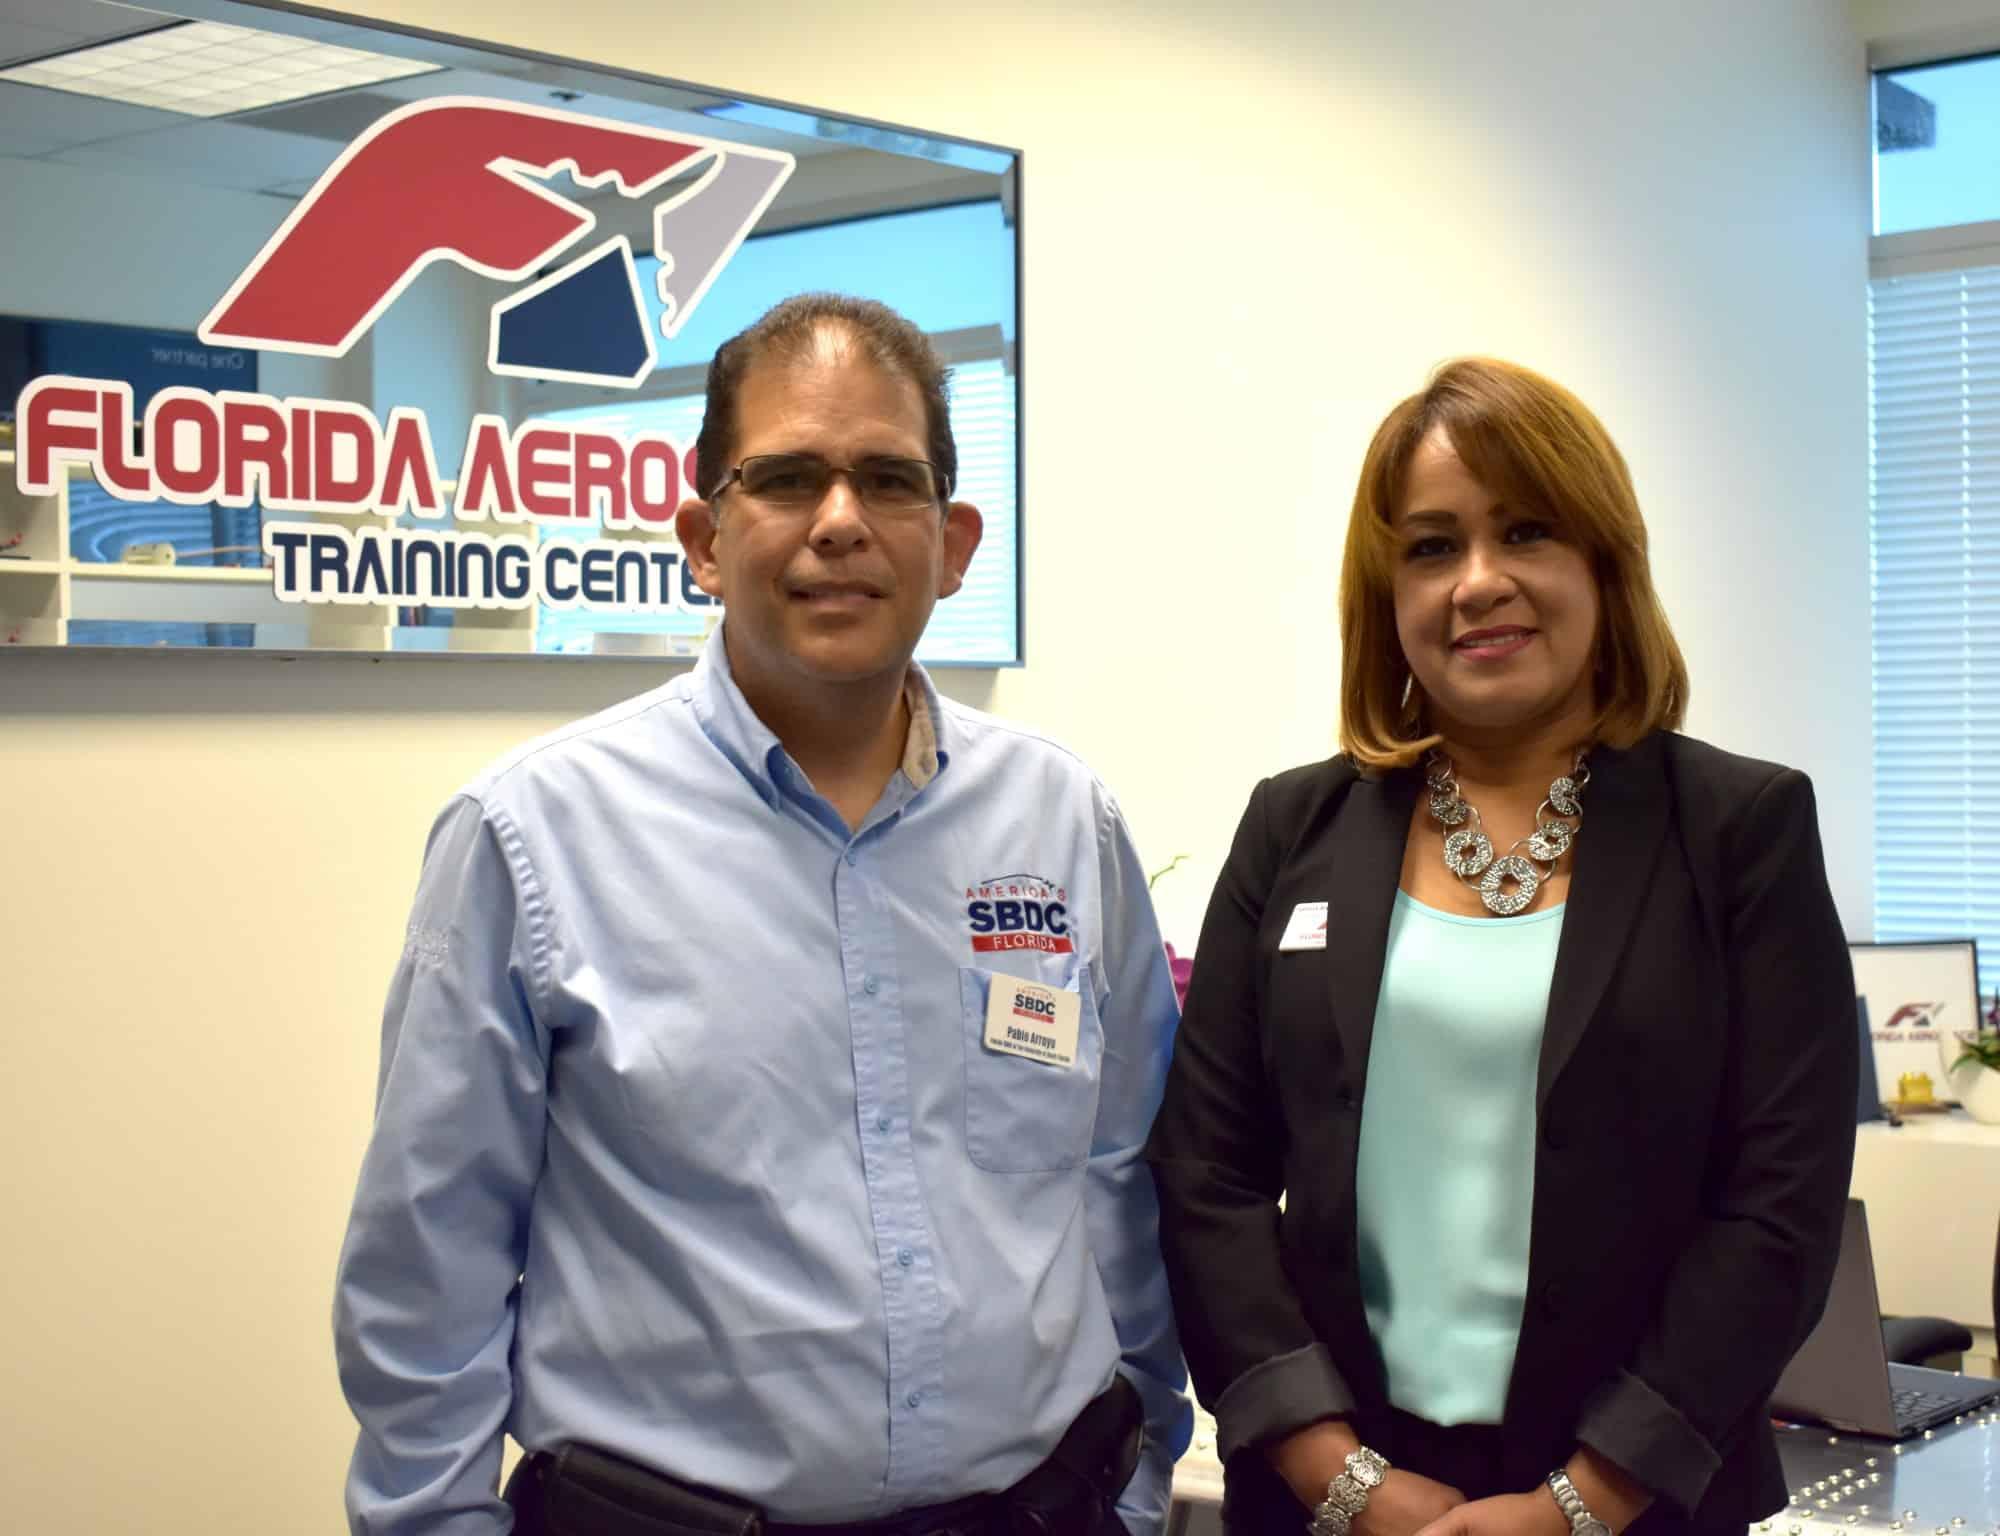 Florida Aerospace Training Center of Hillsborough County